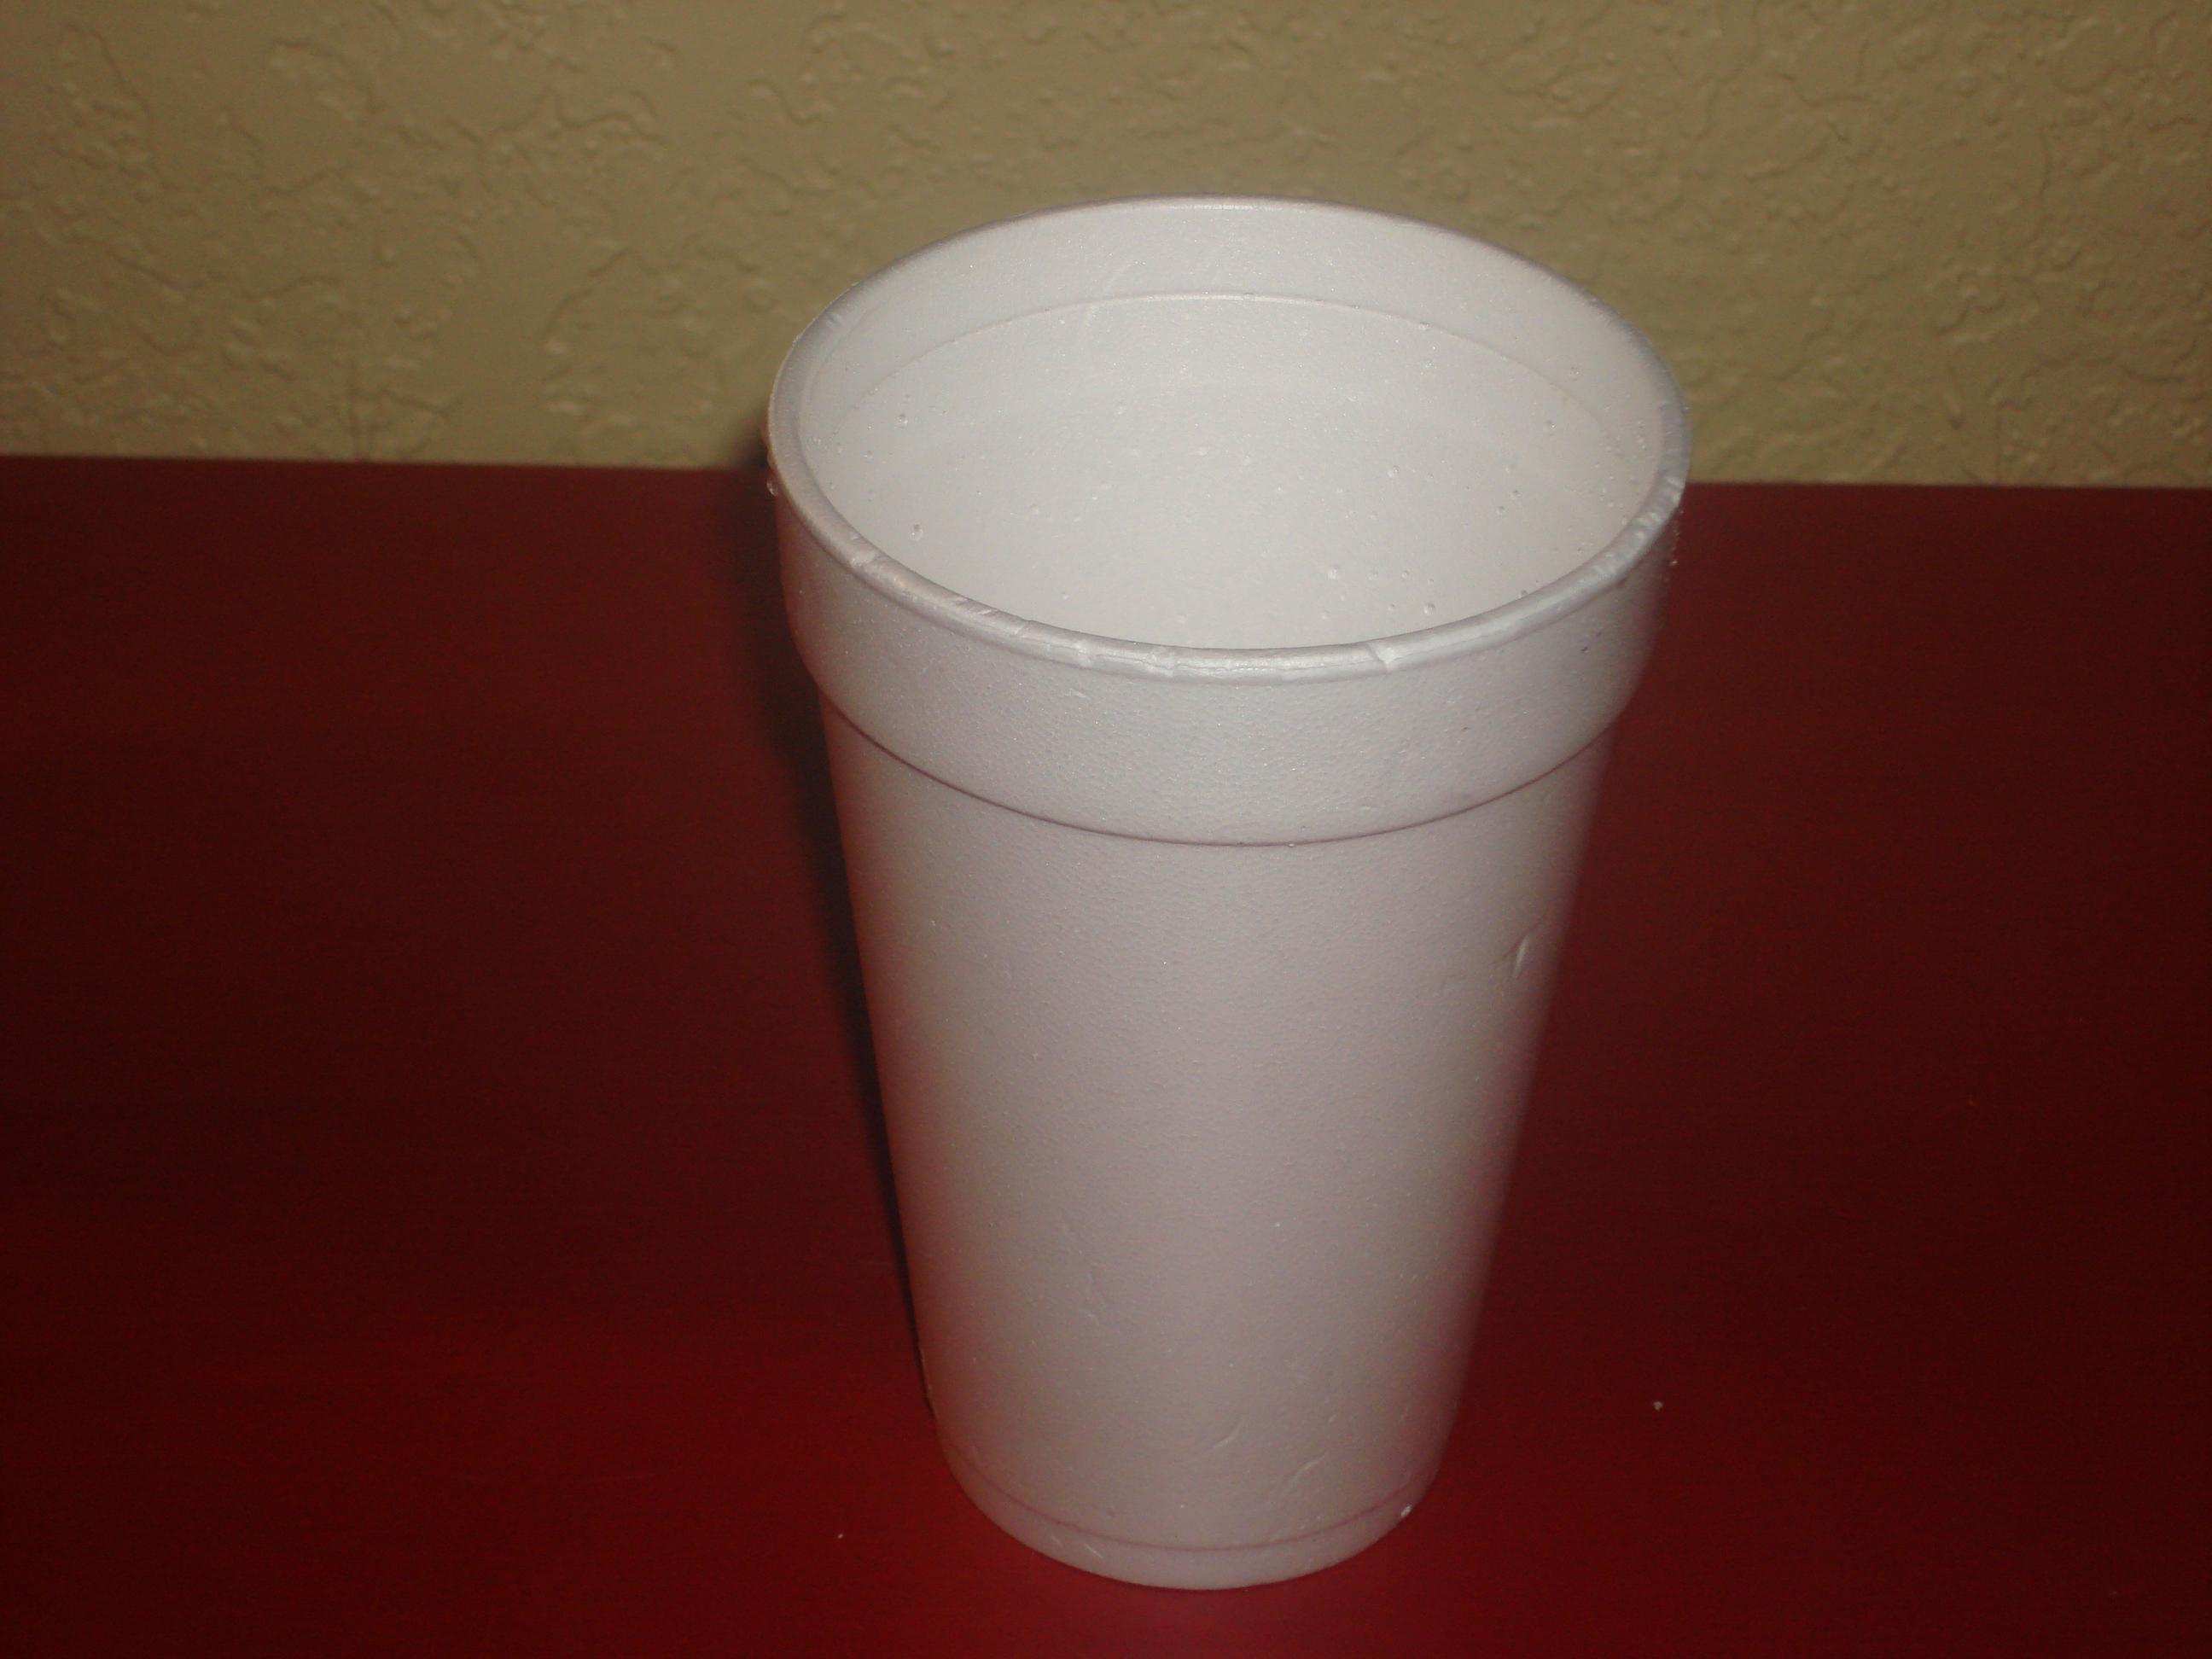 prank cup